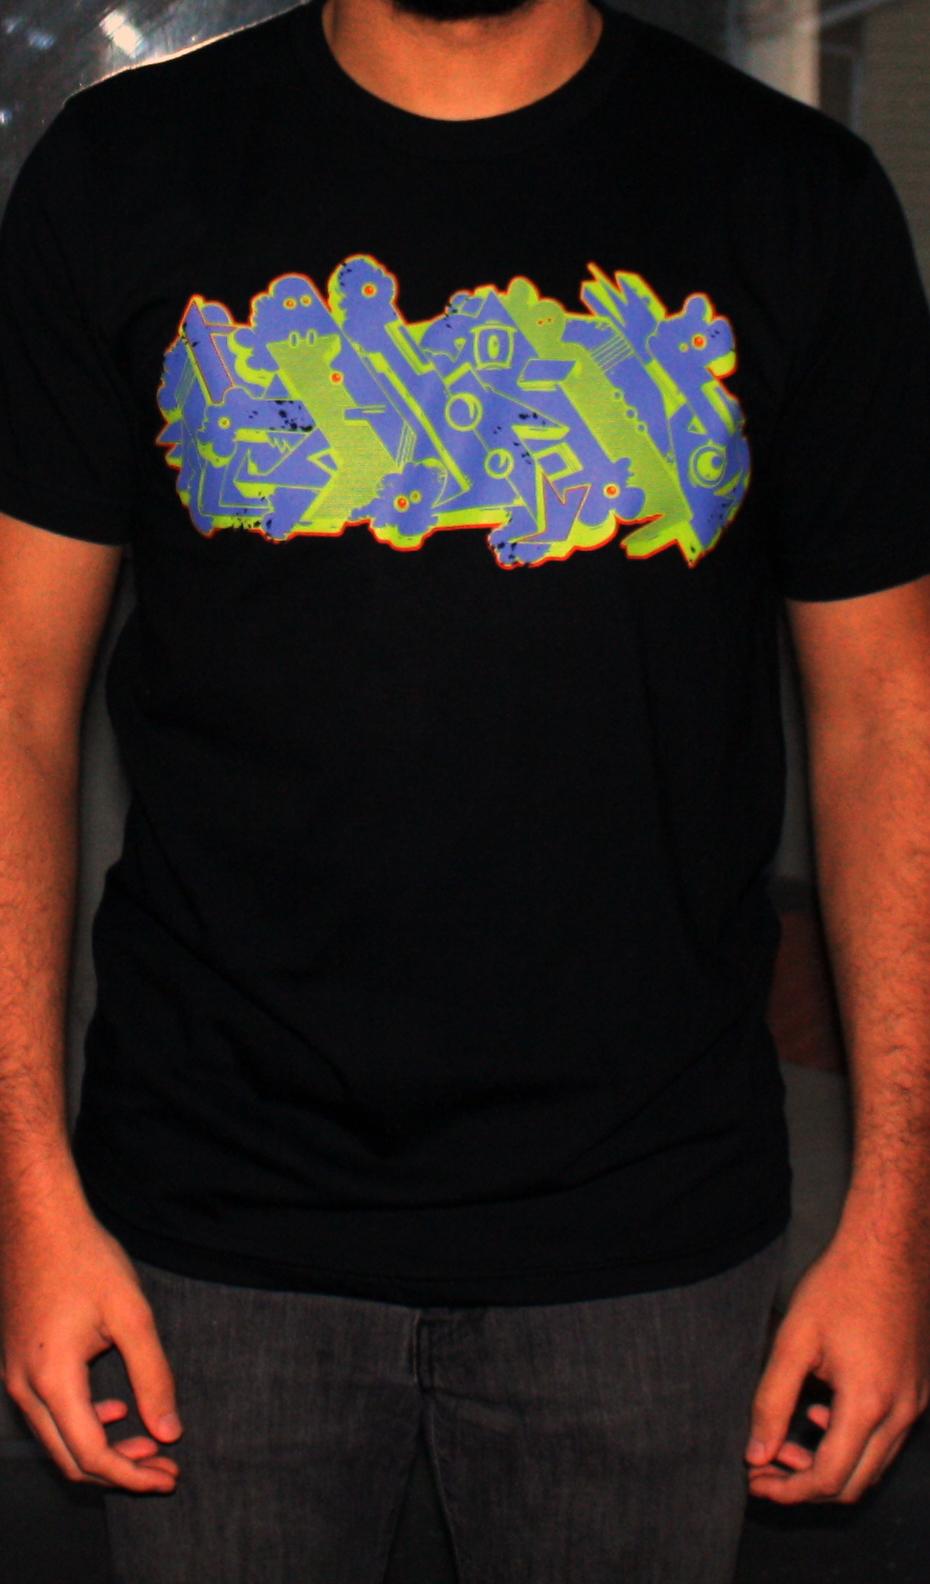 Alien graffiti t shirt by nuskuapperal on deviantart